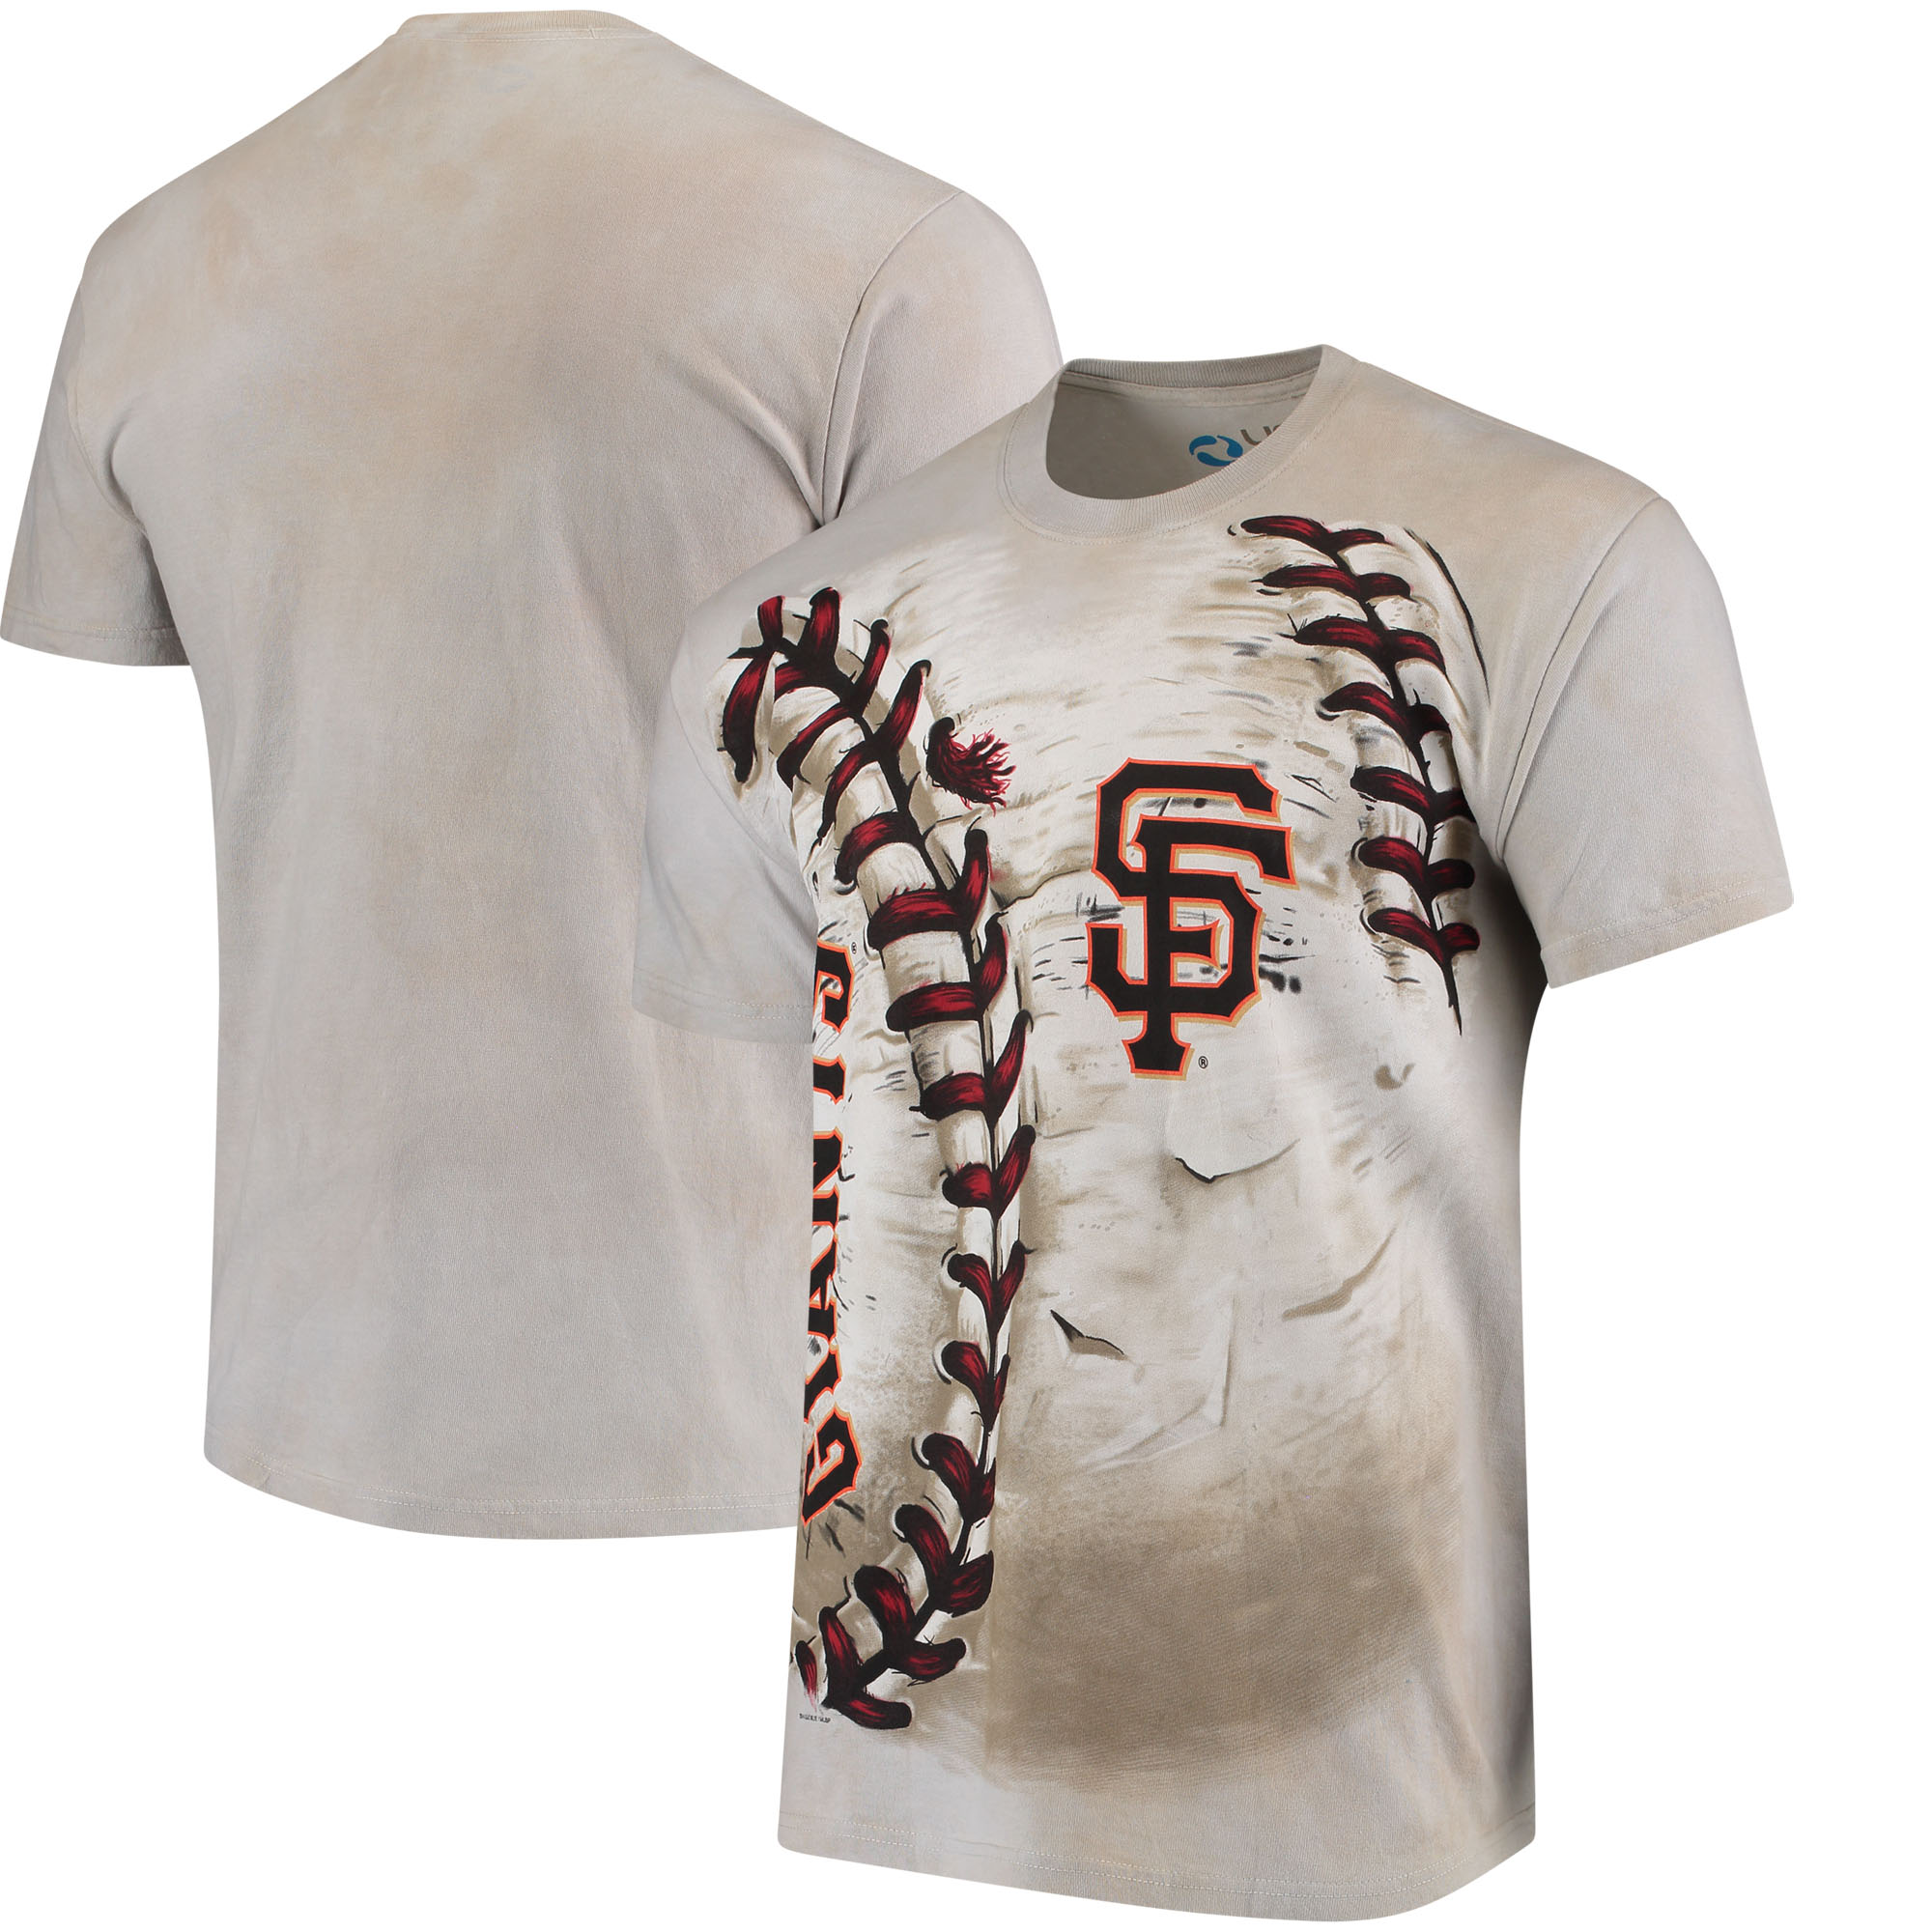 San Francisco Giants Hardball Tie-Dye T-Shirt - Cream